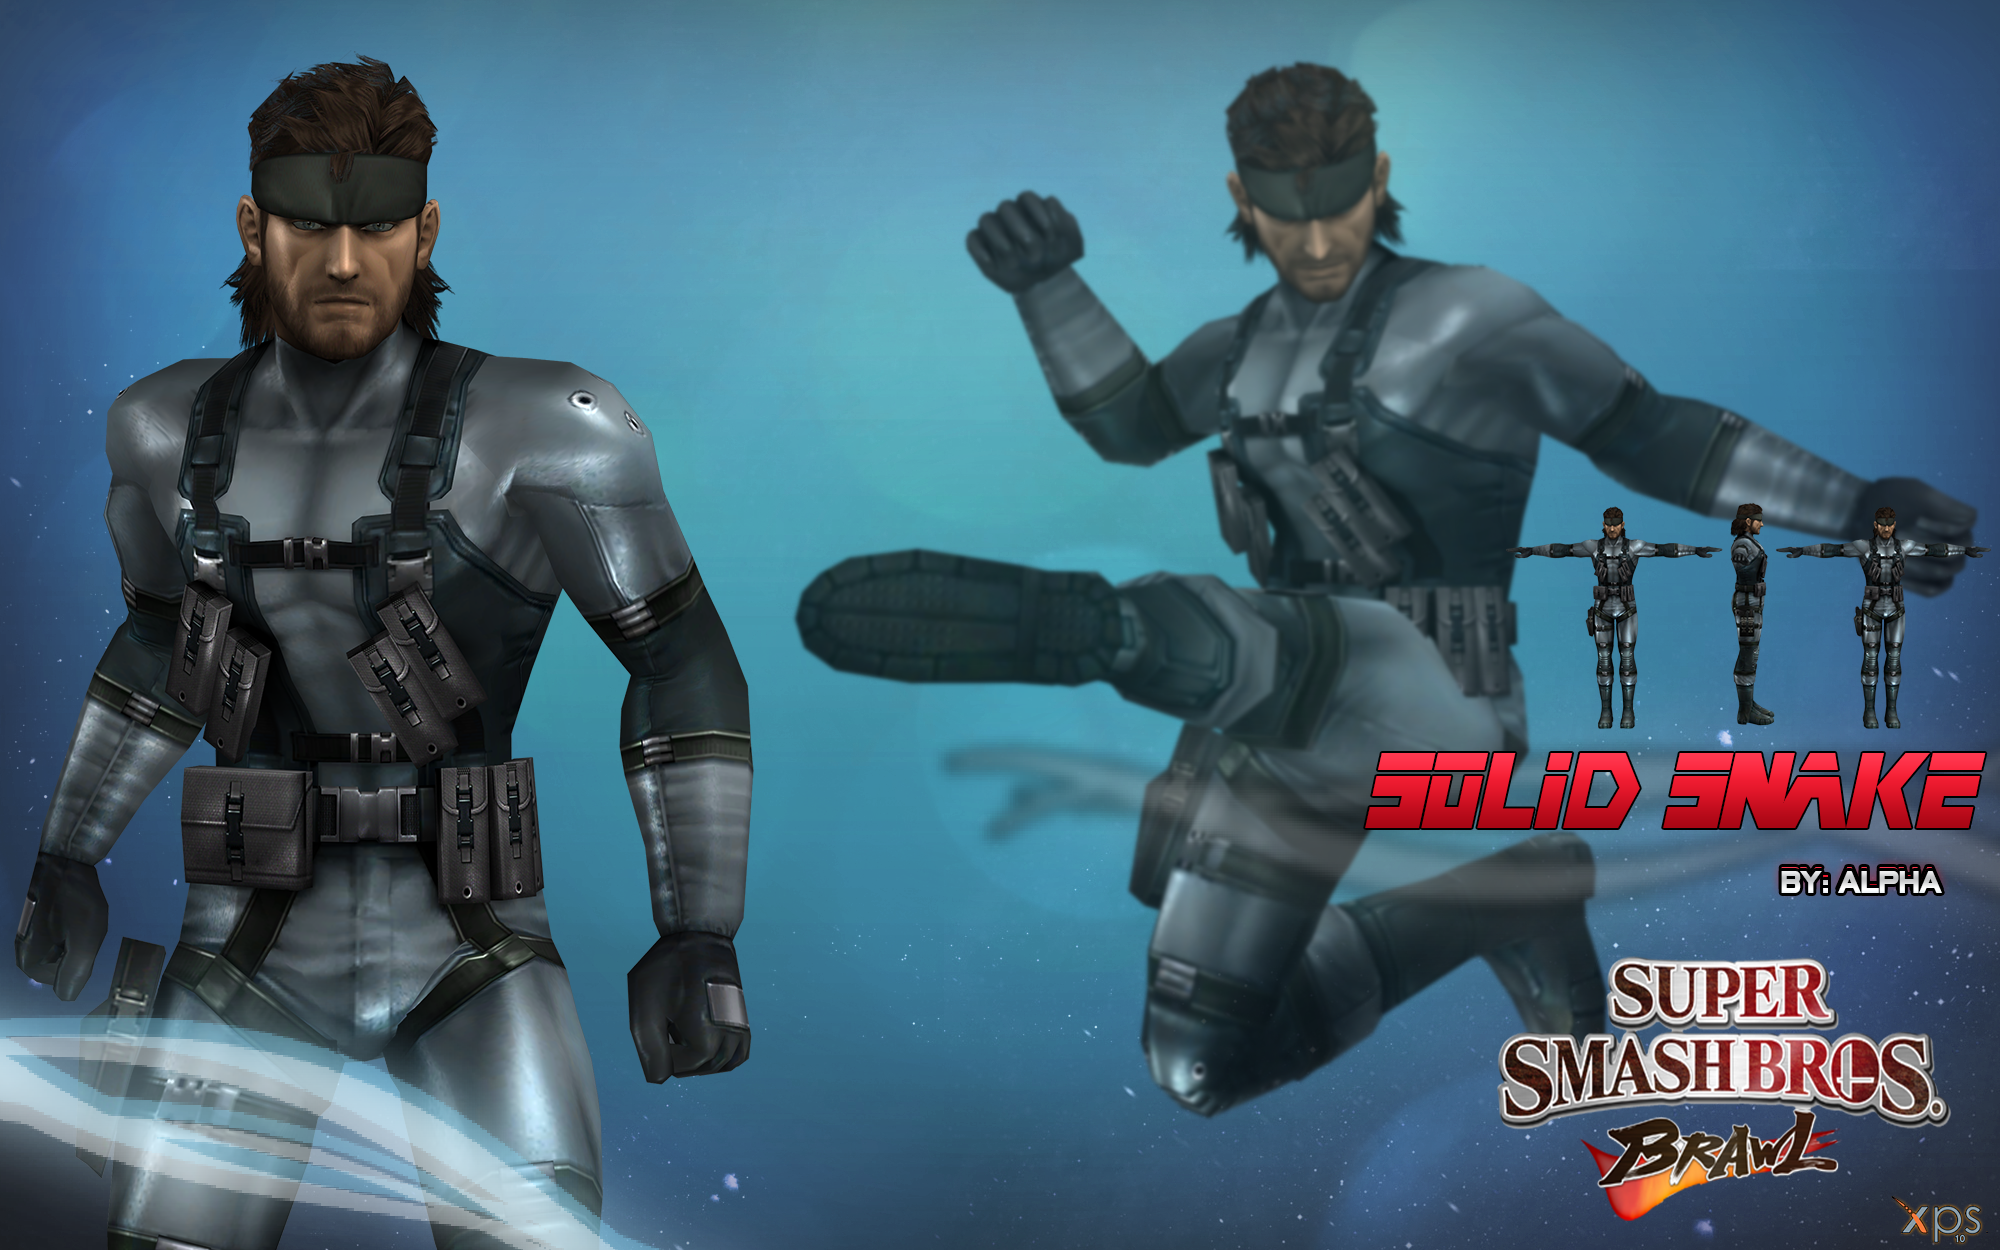 Super Snake 2017 >> Super Smash Bros. Brawl - Solid Snake by XNASyndicate on ...